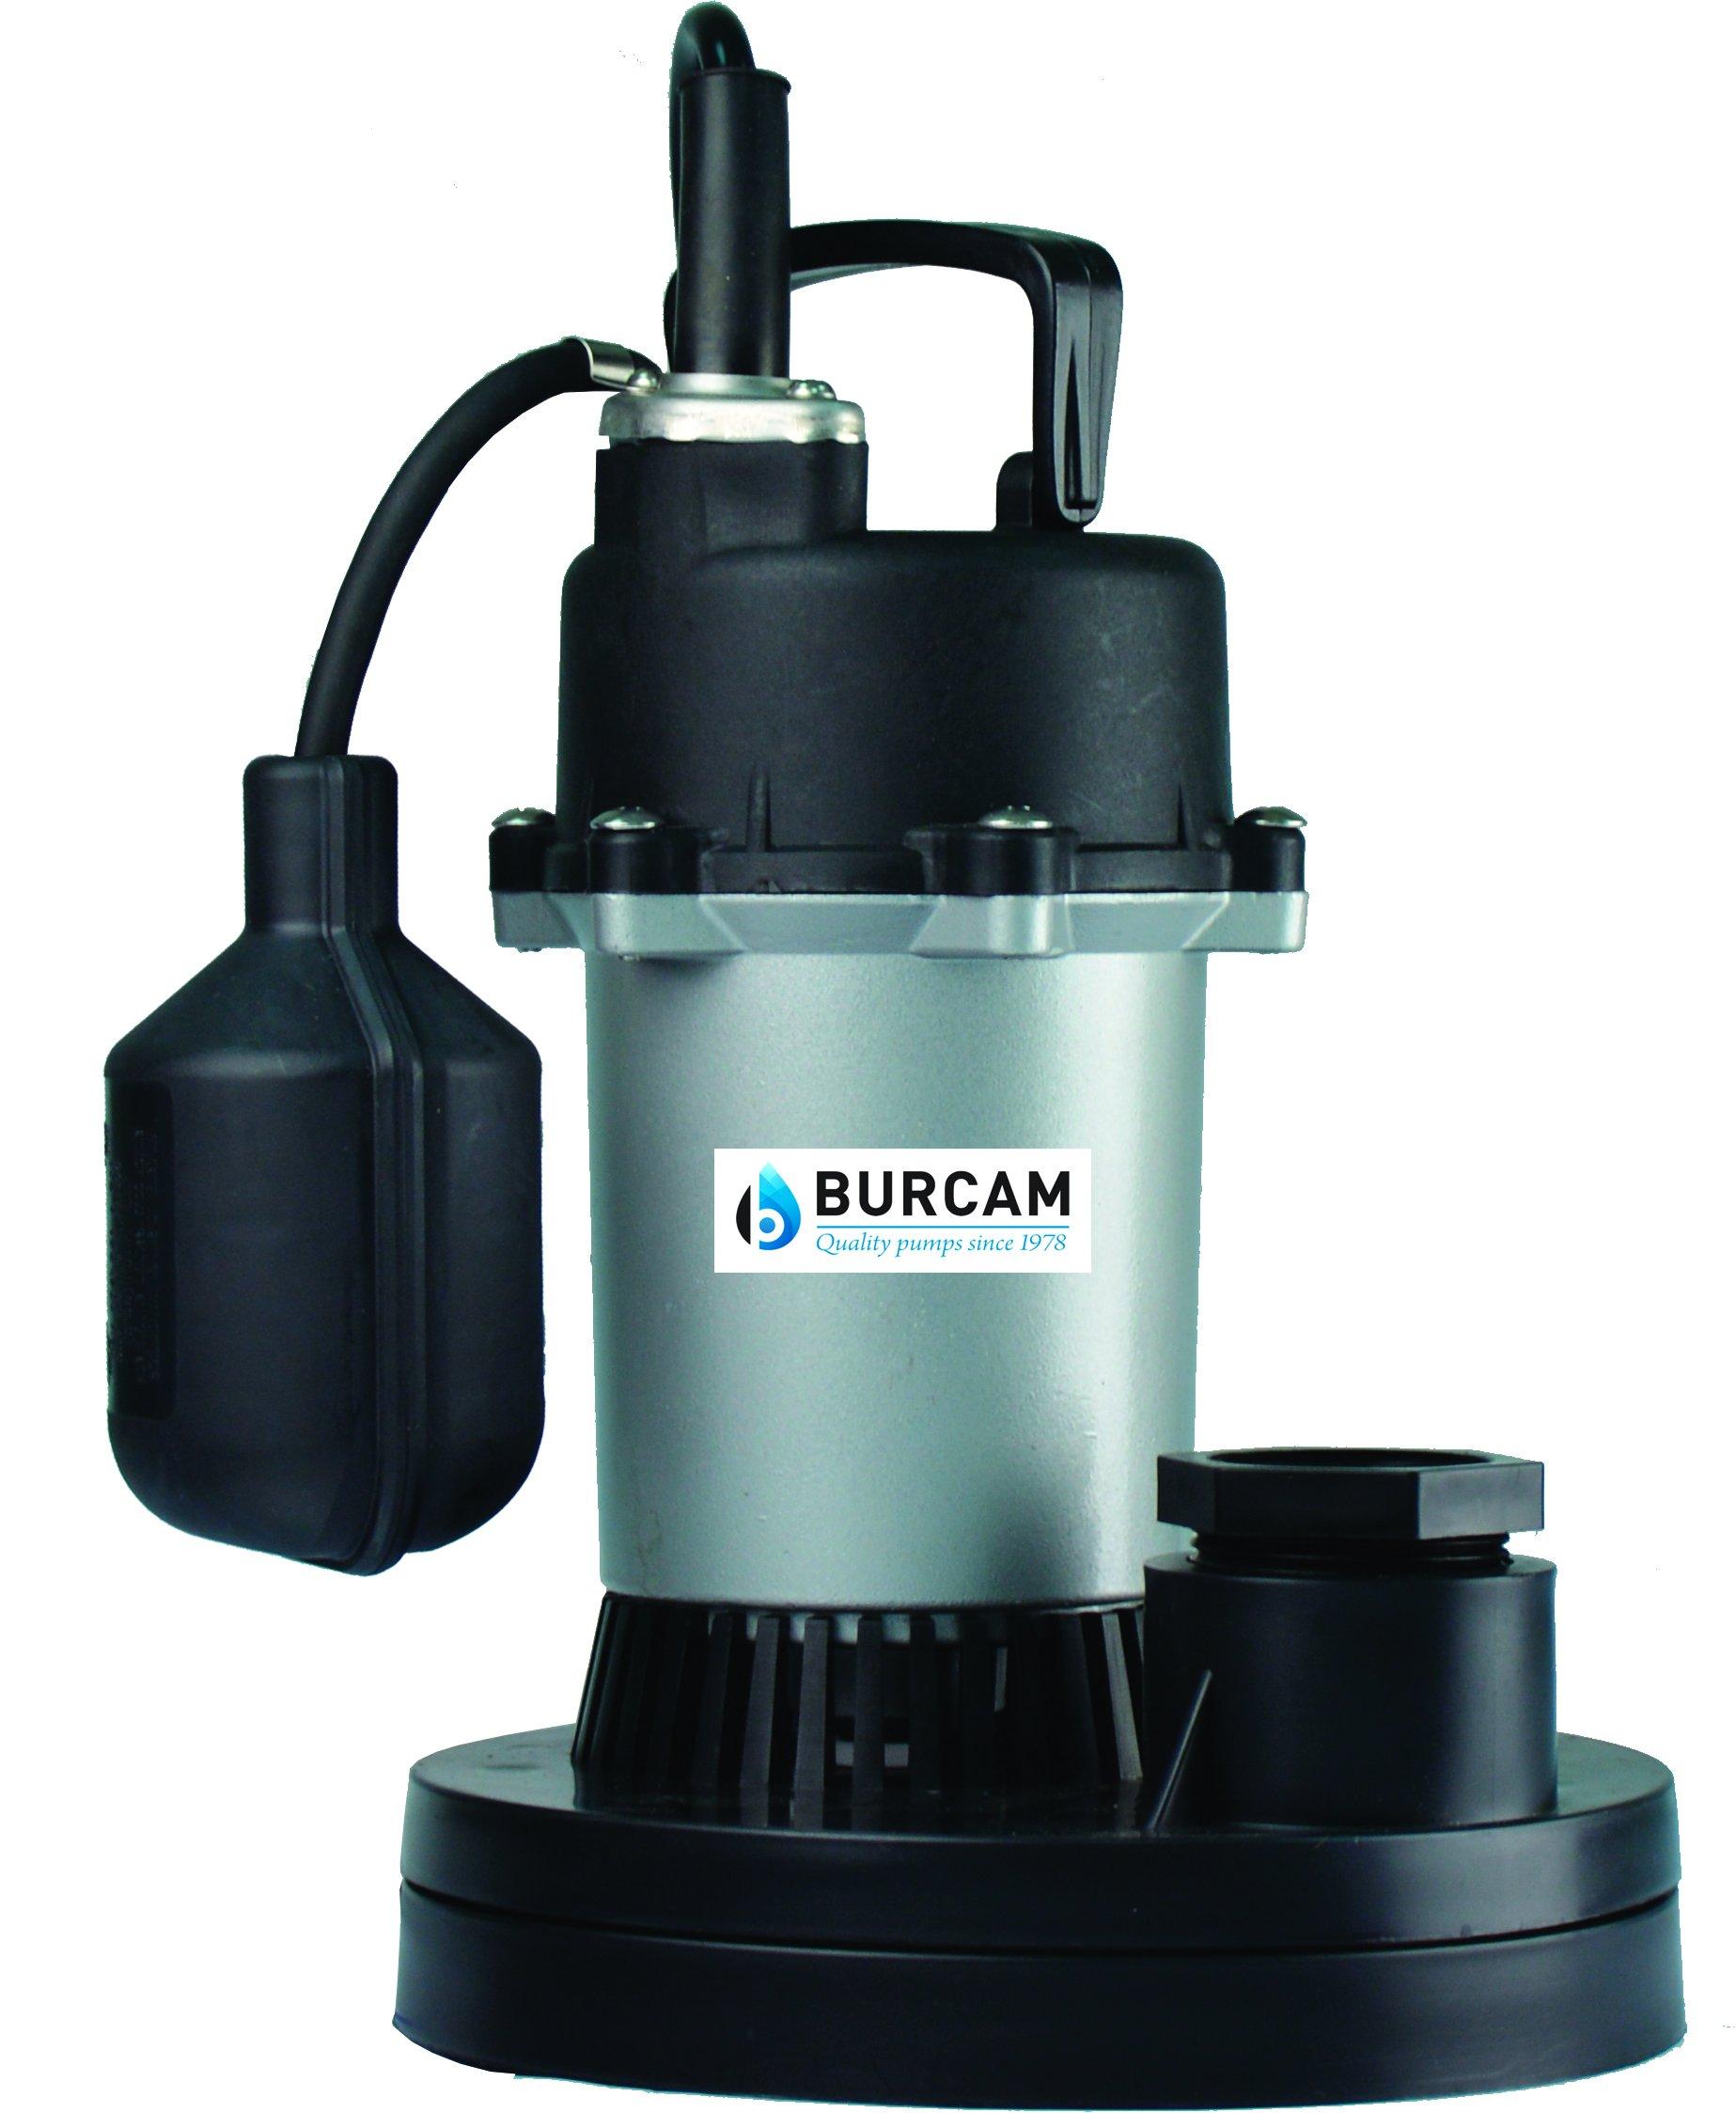 Bur-Cam 300500Z 1/3 Horsepower Z Coated Submersible Sump Pump Mechanical Float Switch, 115V/1-1/2 In Npt by Bur-Cam (Image #1)